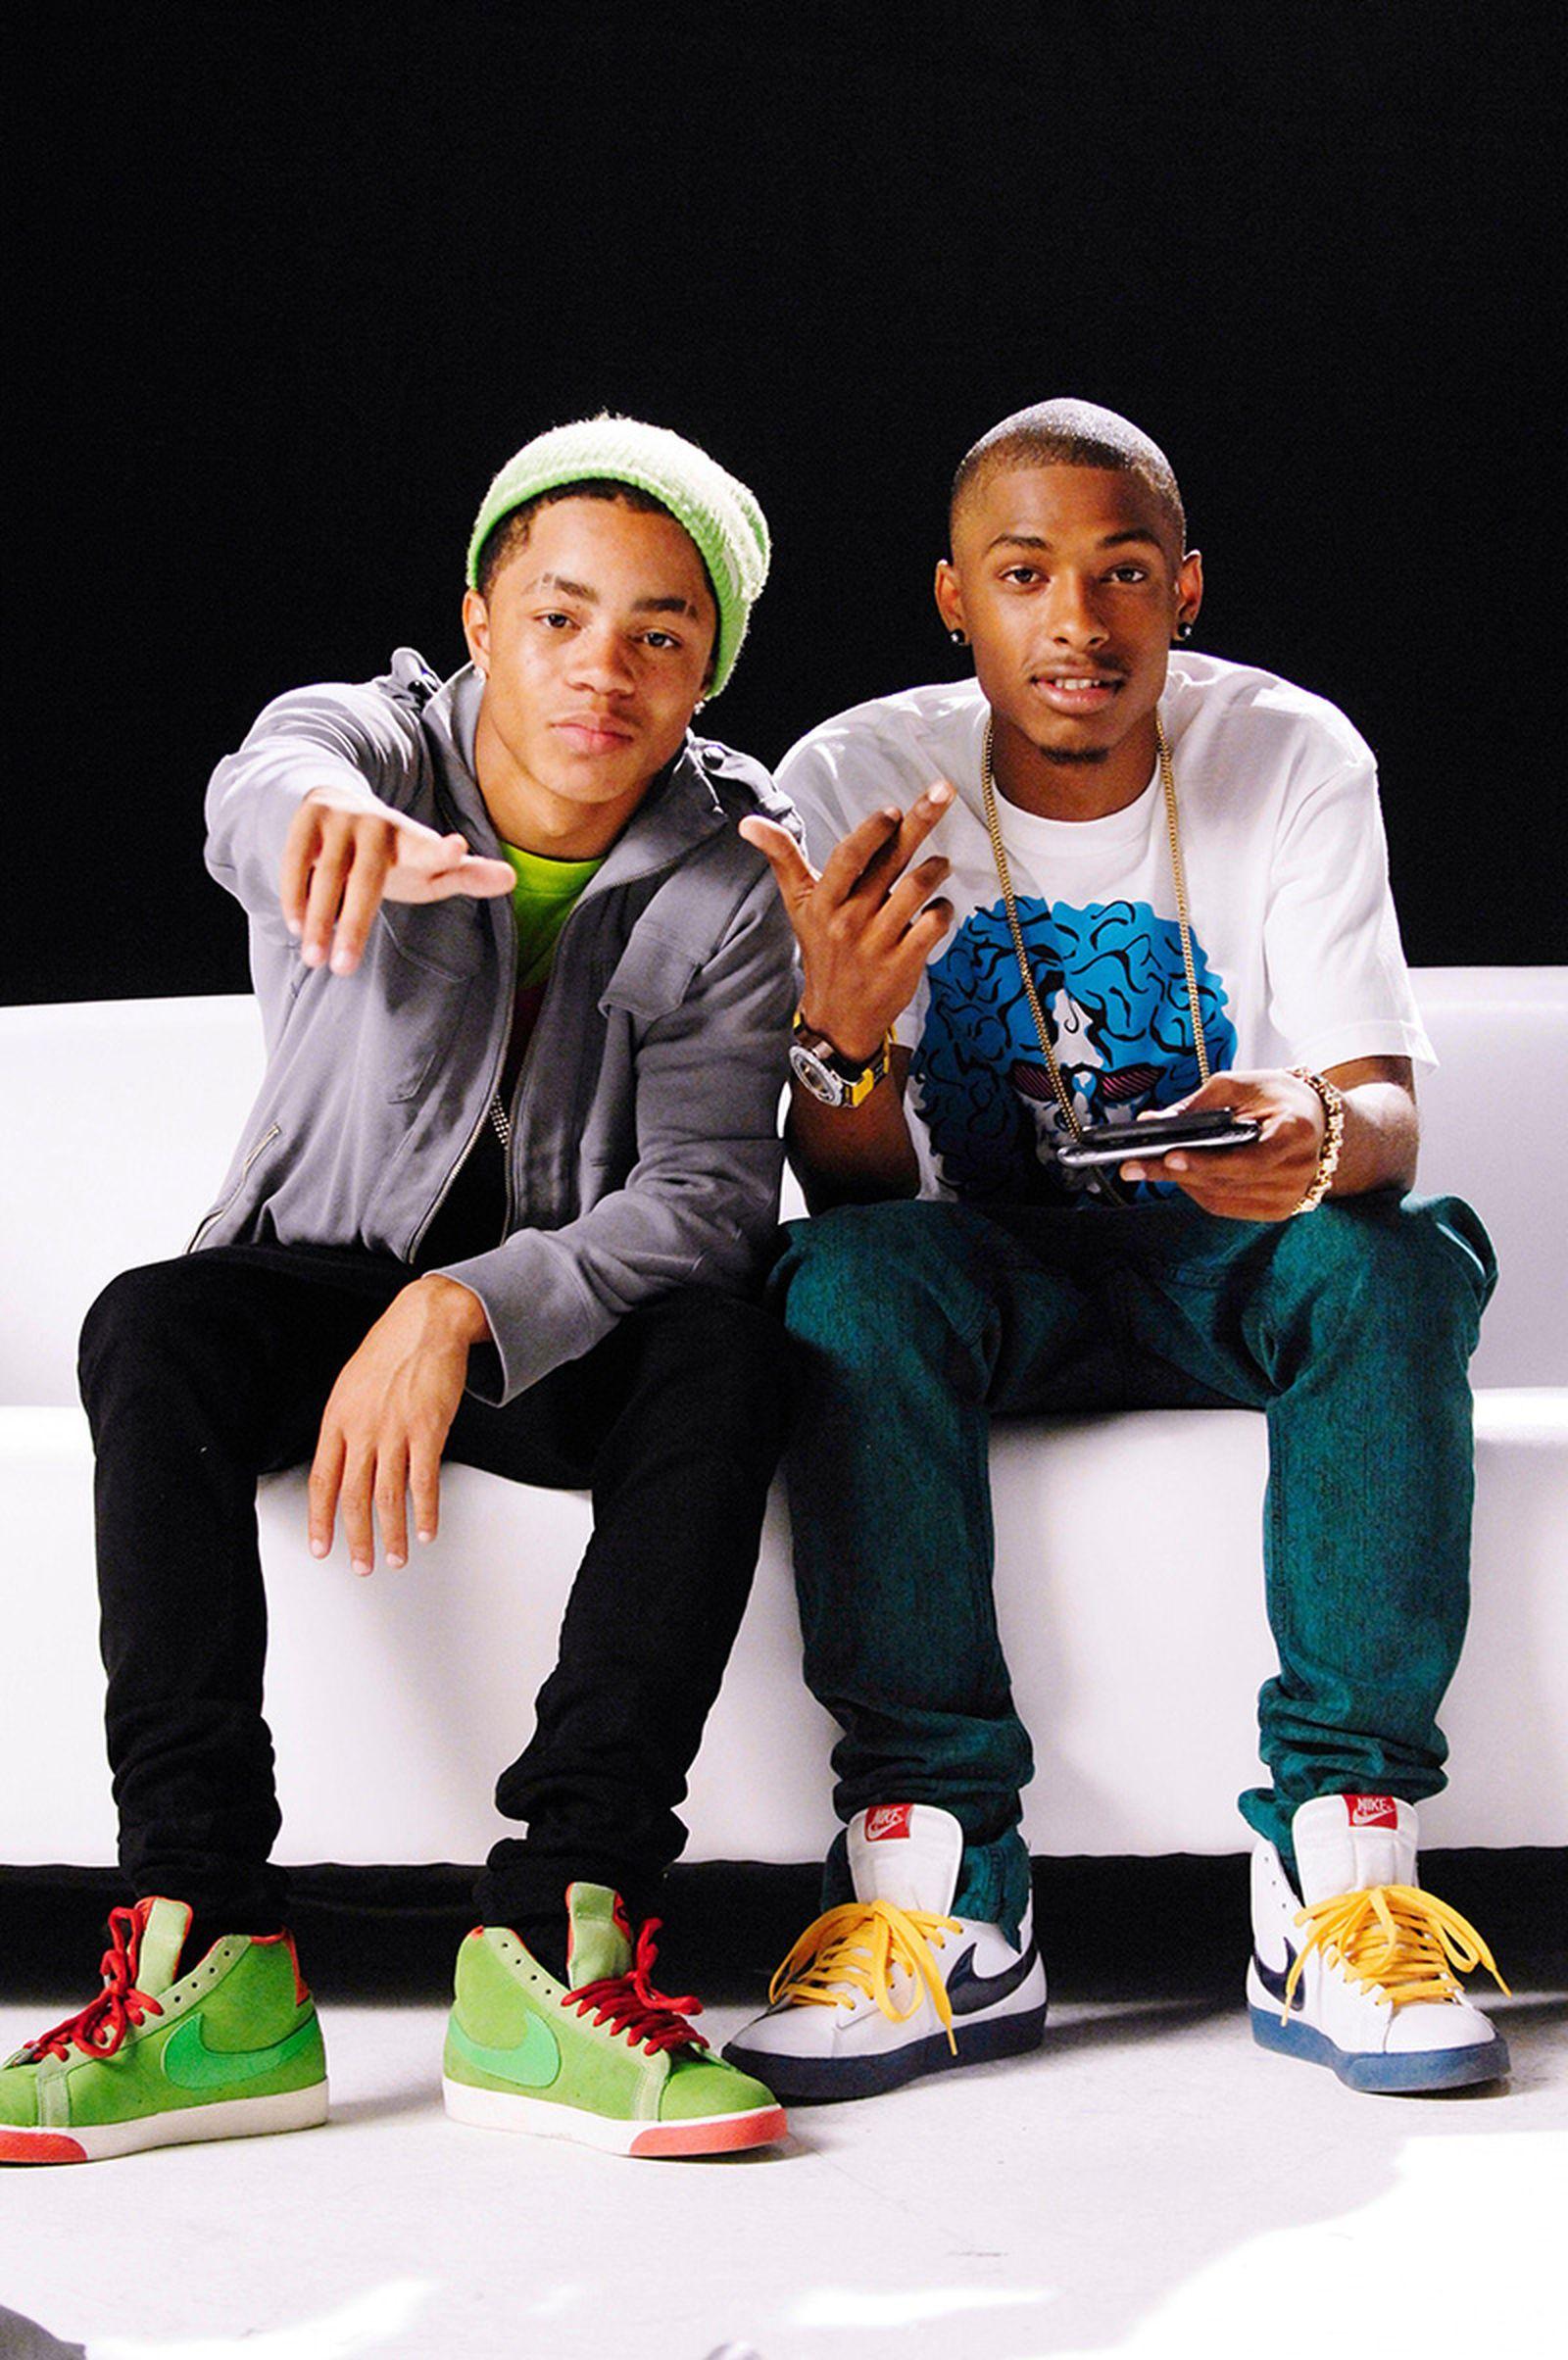 history-skinny-jeans-became-hip-hops-denim-choice-01